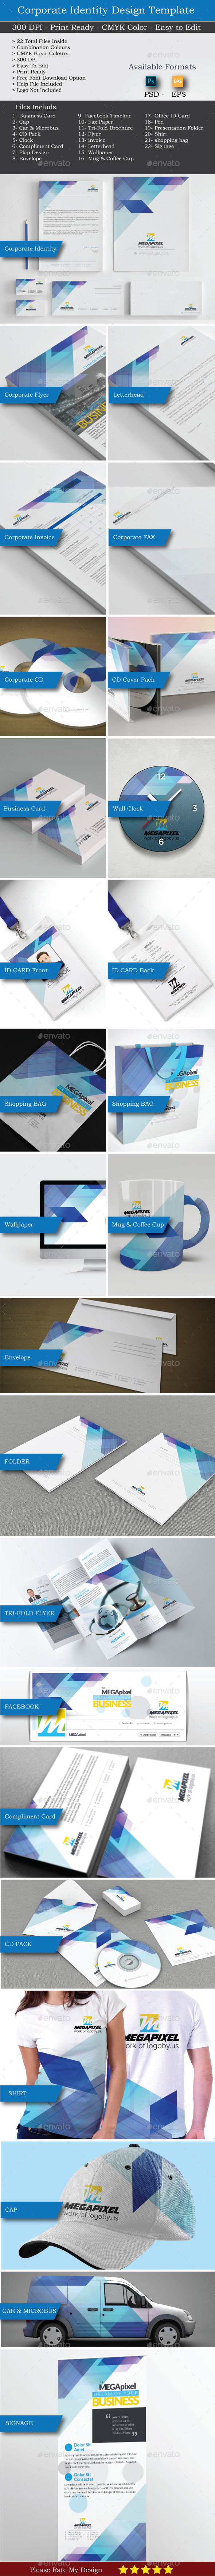 Corporate Identity Set-1 - Stationery Print Templates